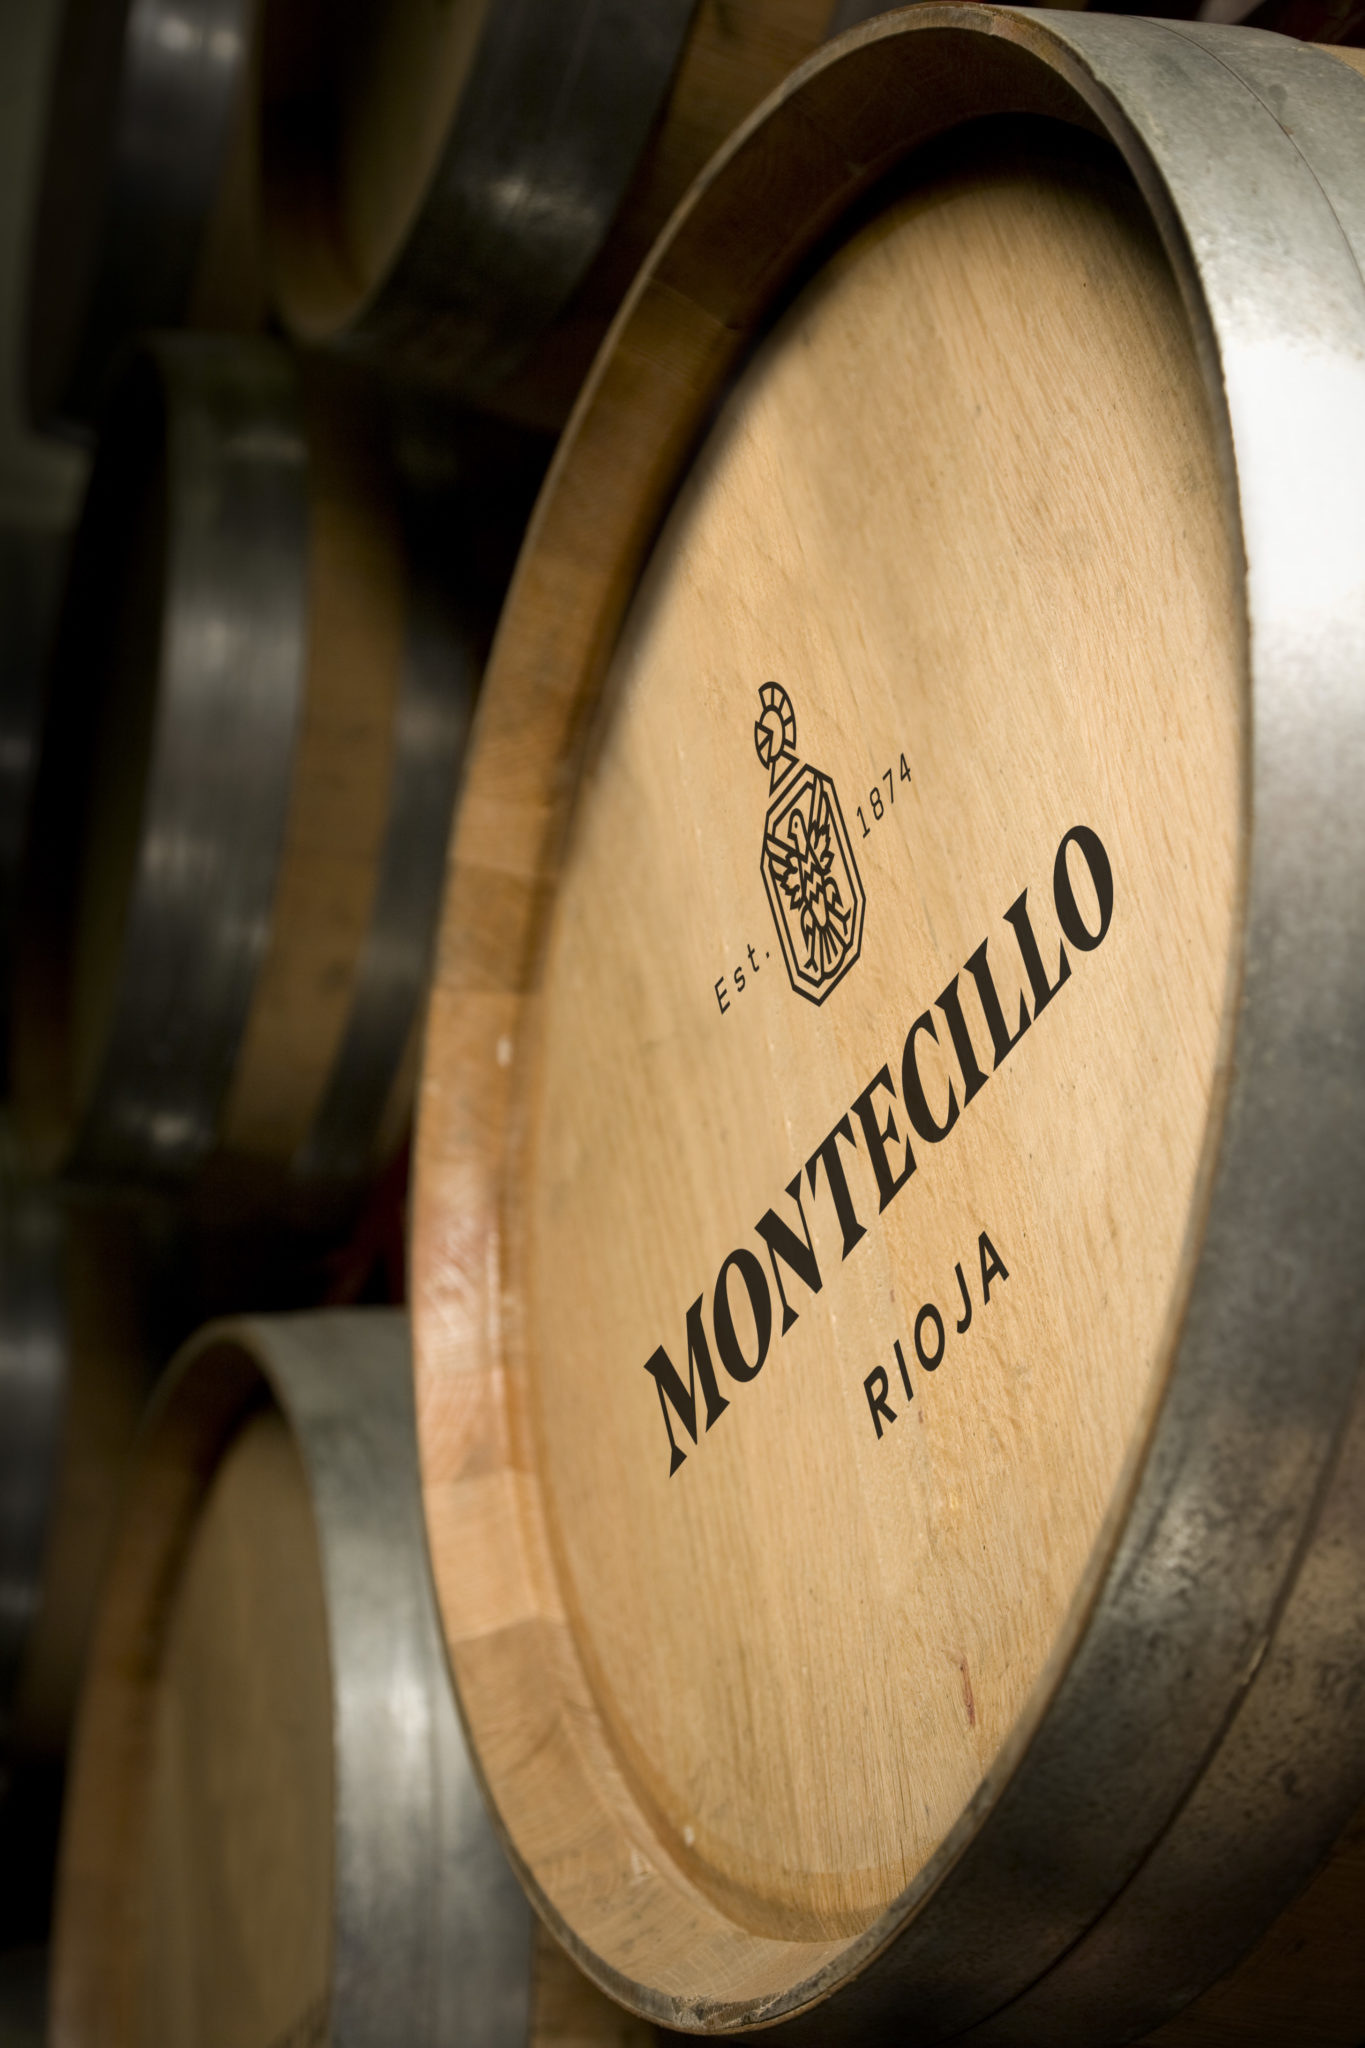 The importance of barrels